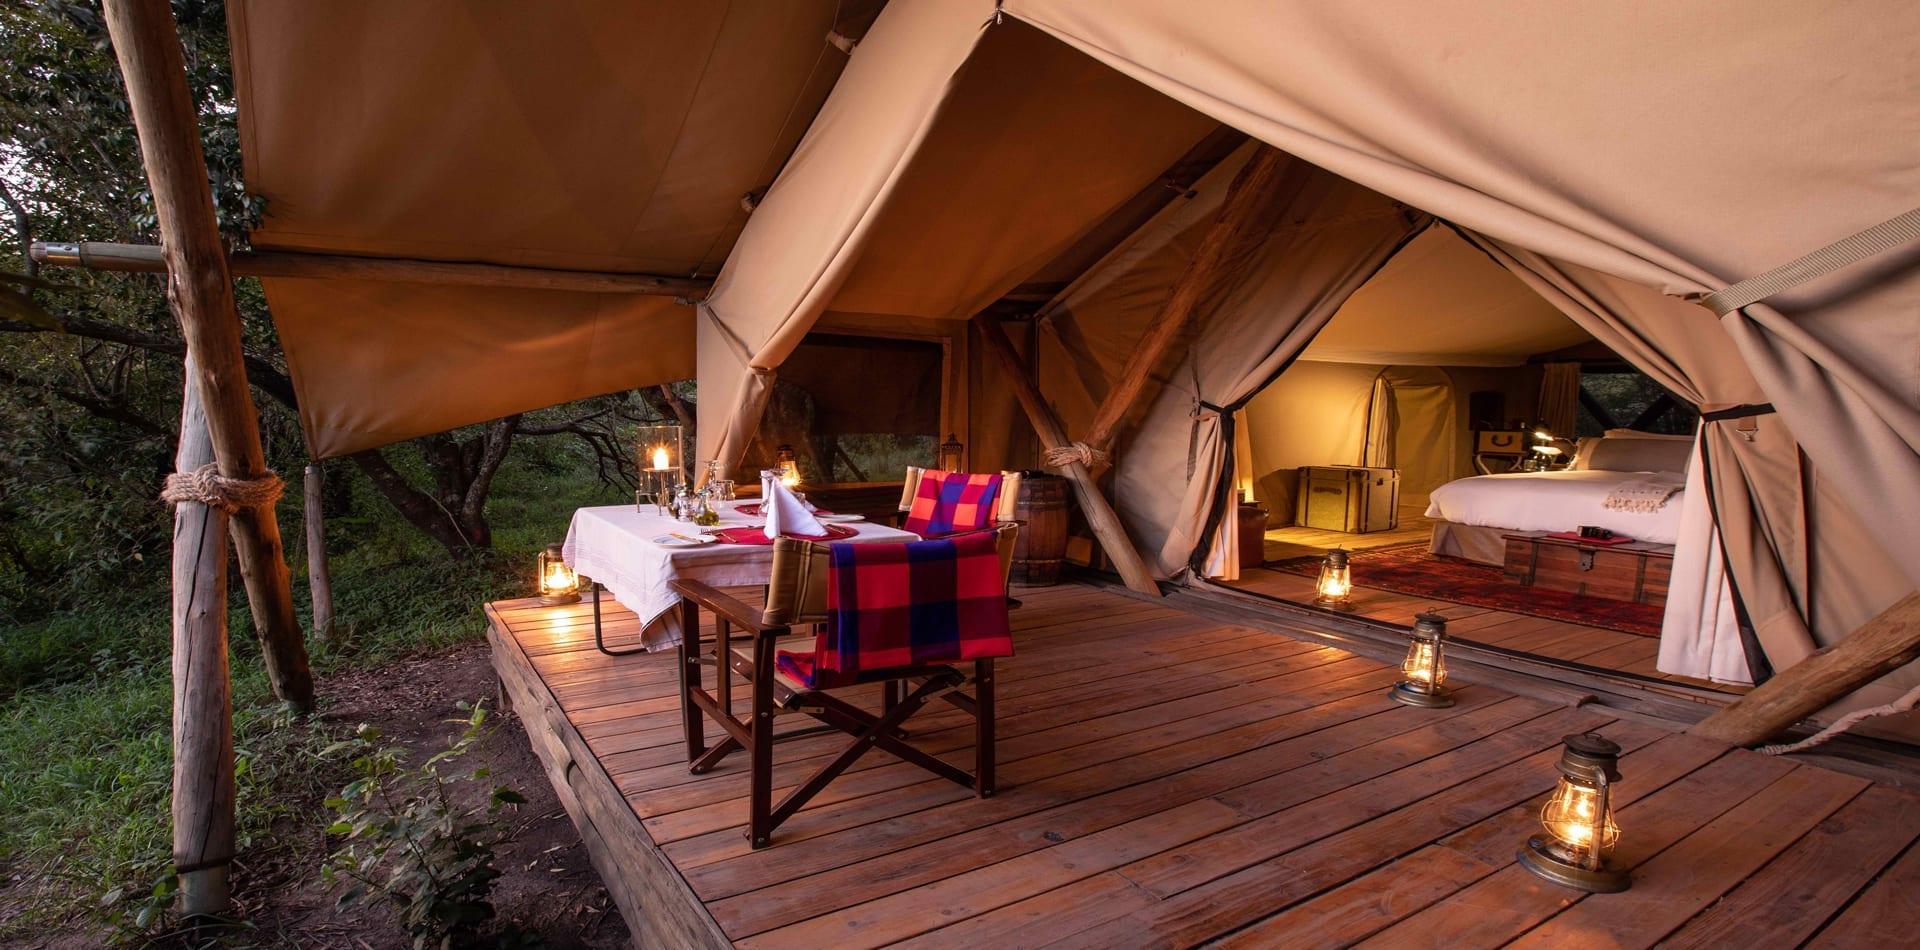 Mara Expedition Camp Kenya Tent Exterior